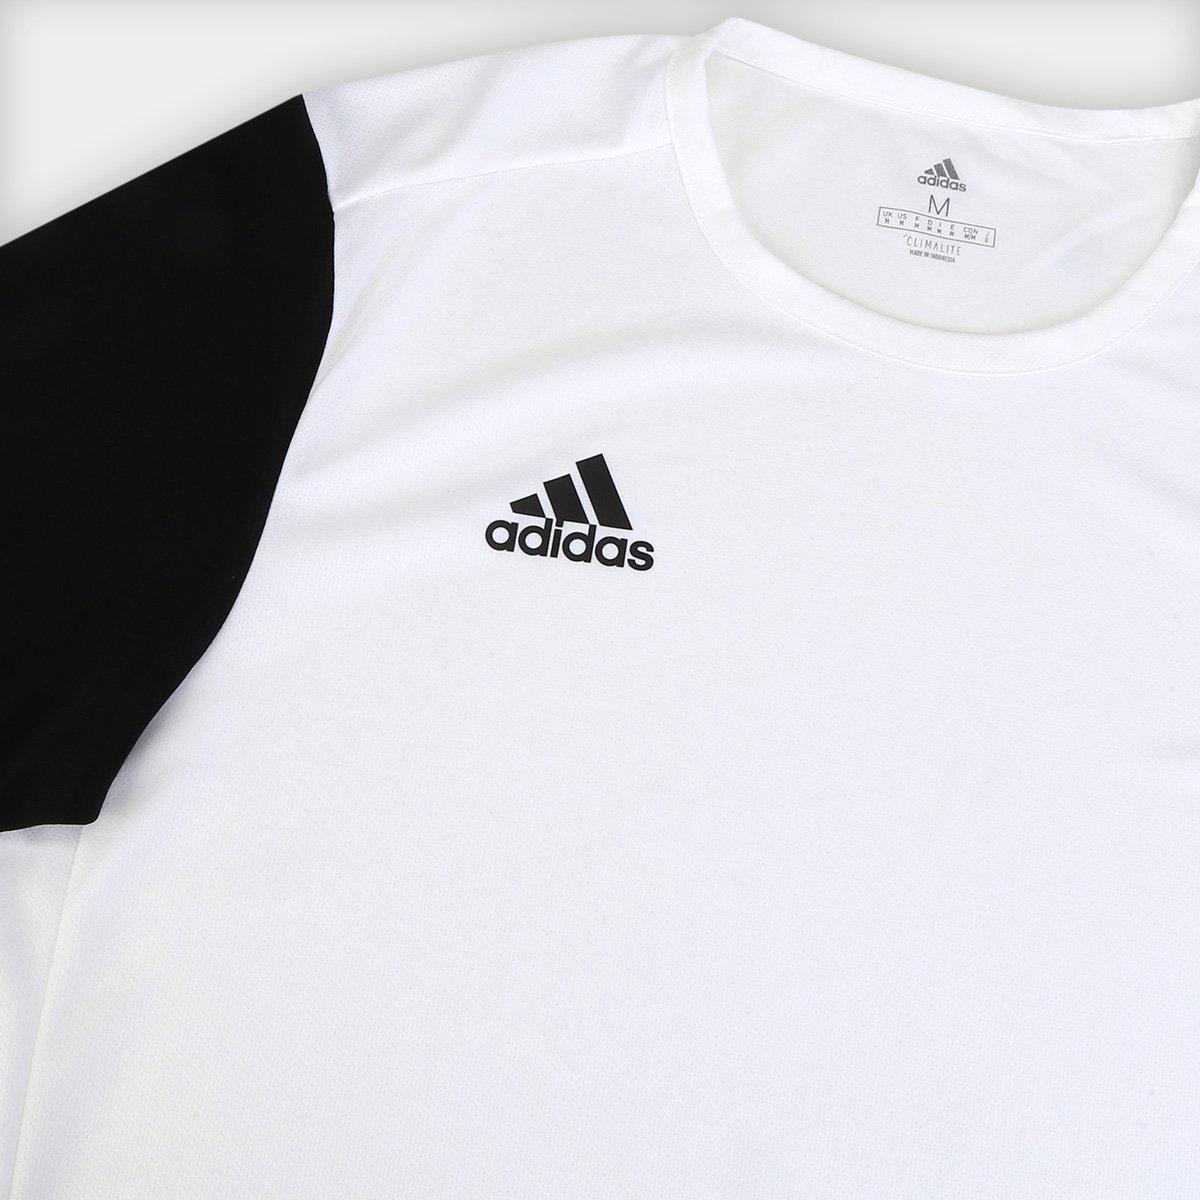 Camisa Estro 19 Adidas Masculina - 3